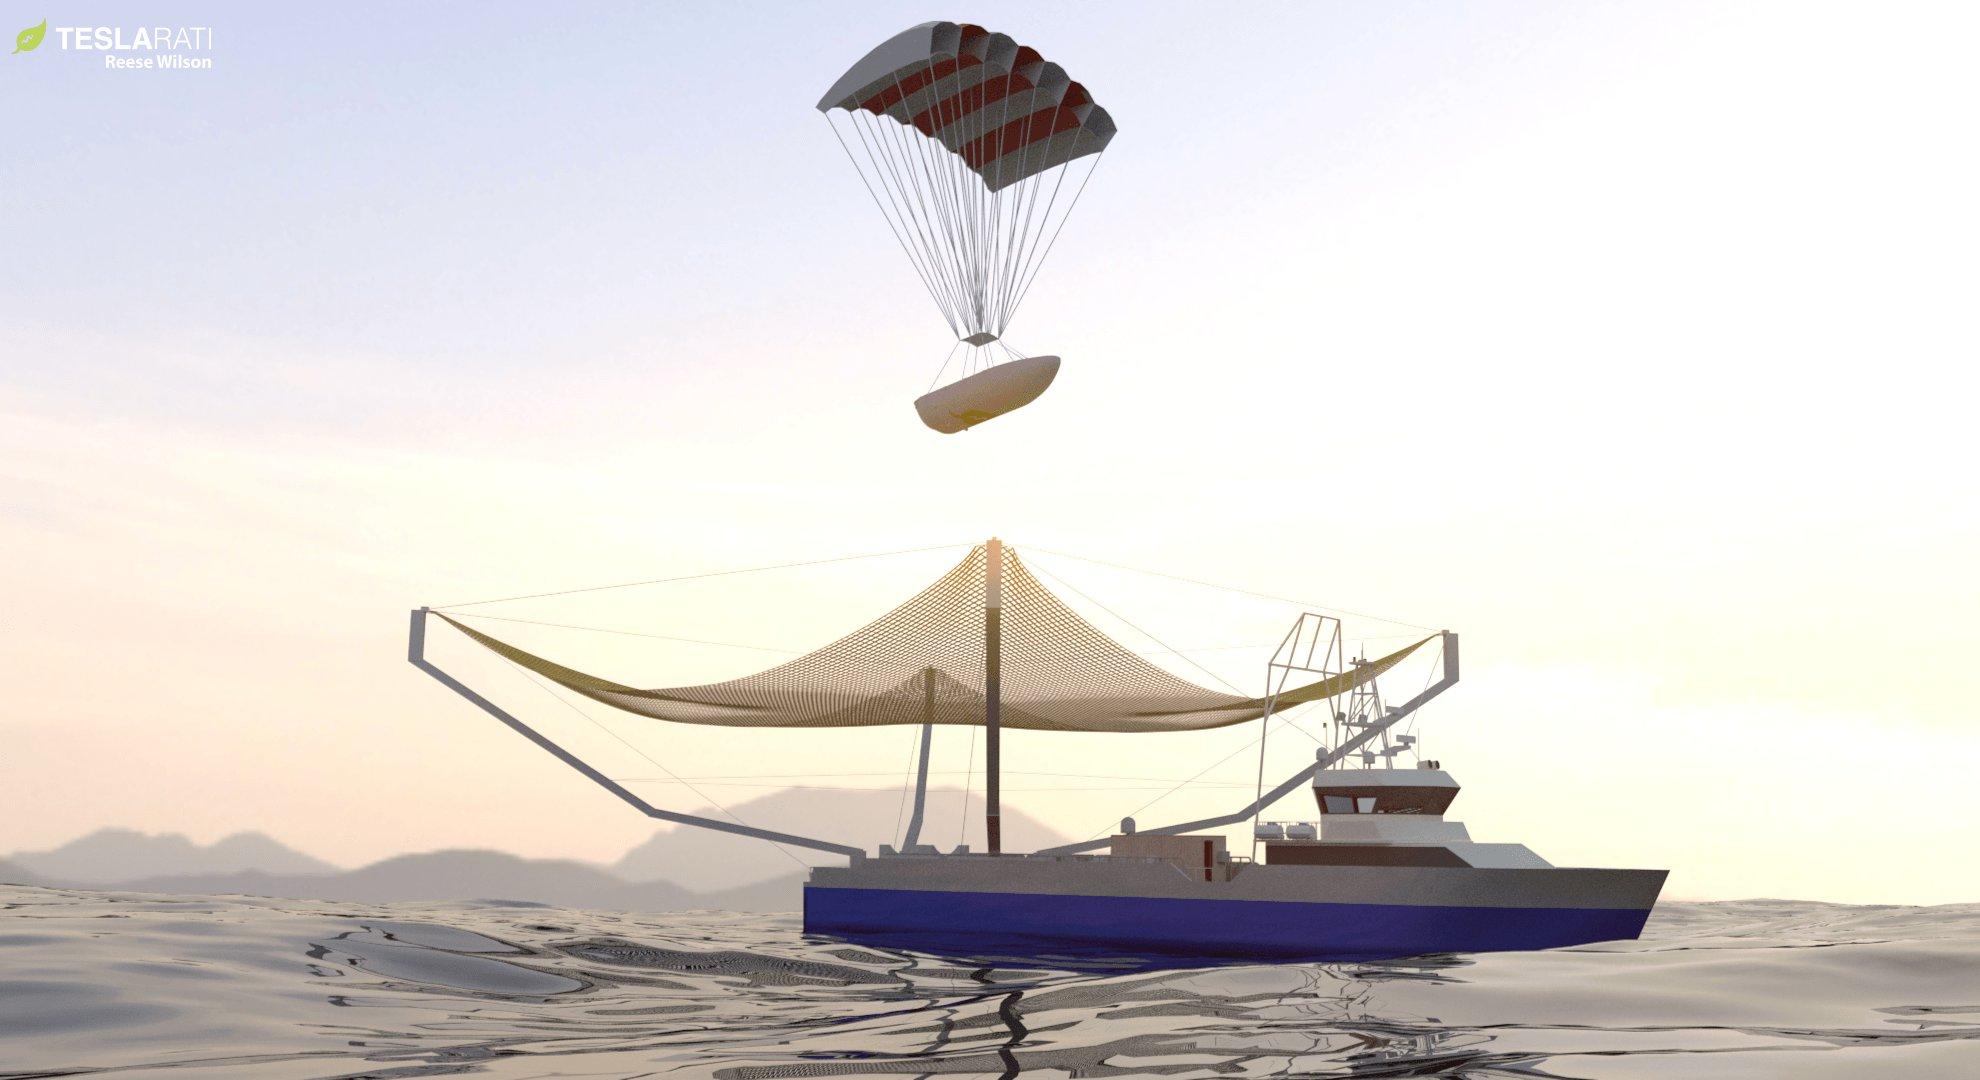 Mr Steven 4X net concept ocean (Reese Wilson) 2